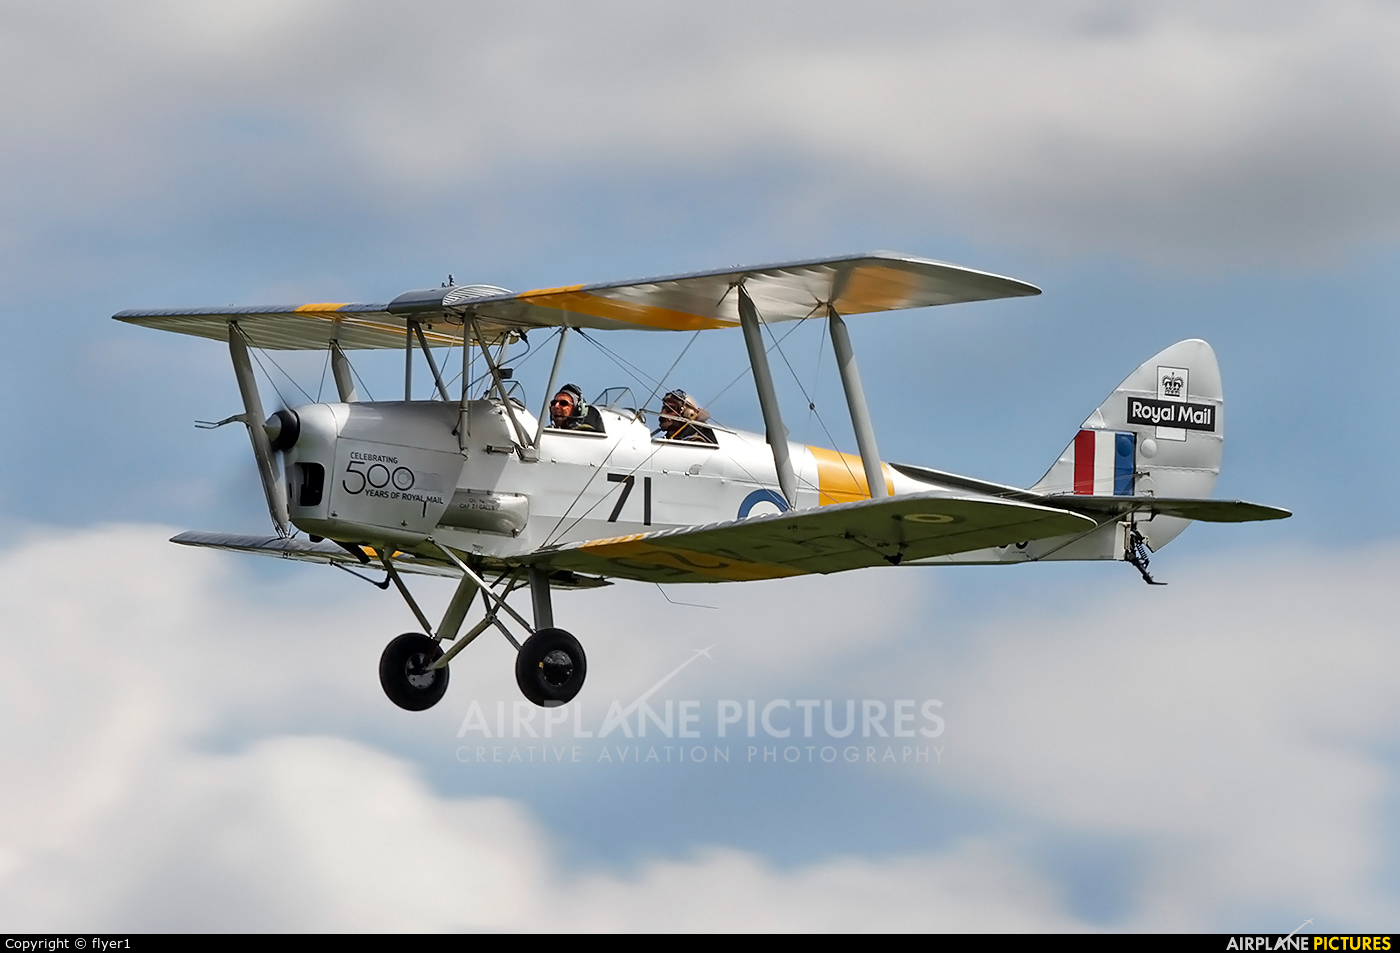 Aero Legends G-ANMO aircraft at Lashenden / Headcorn